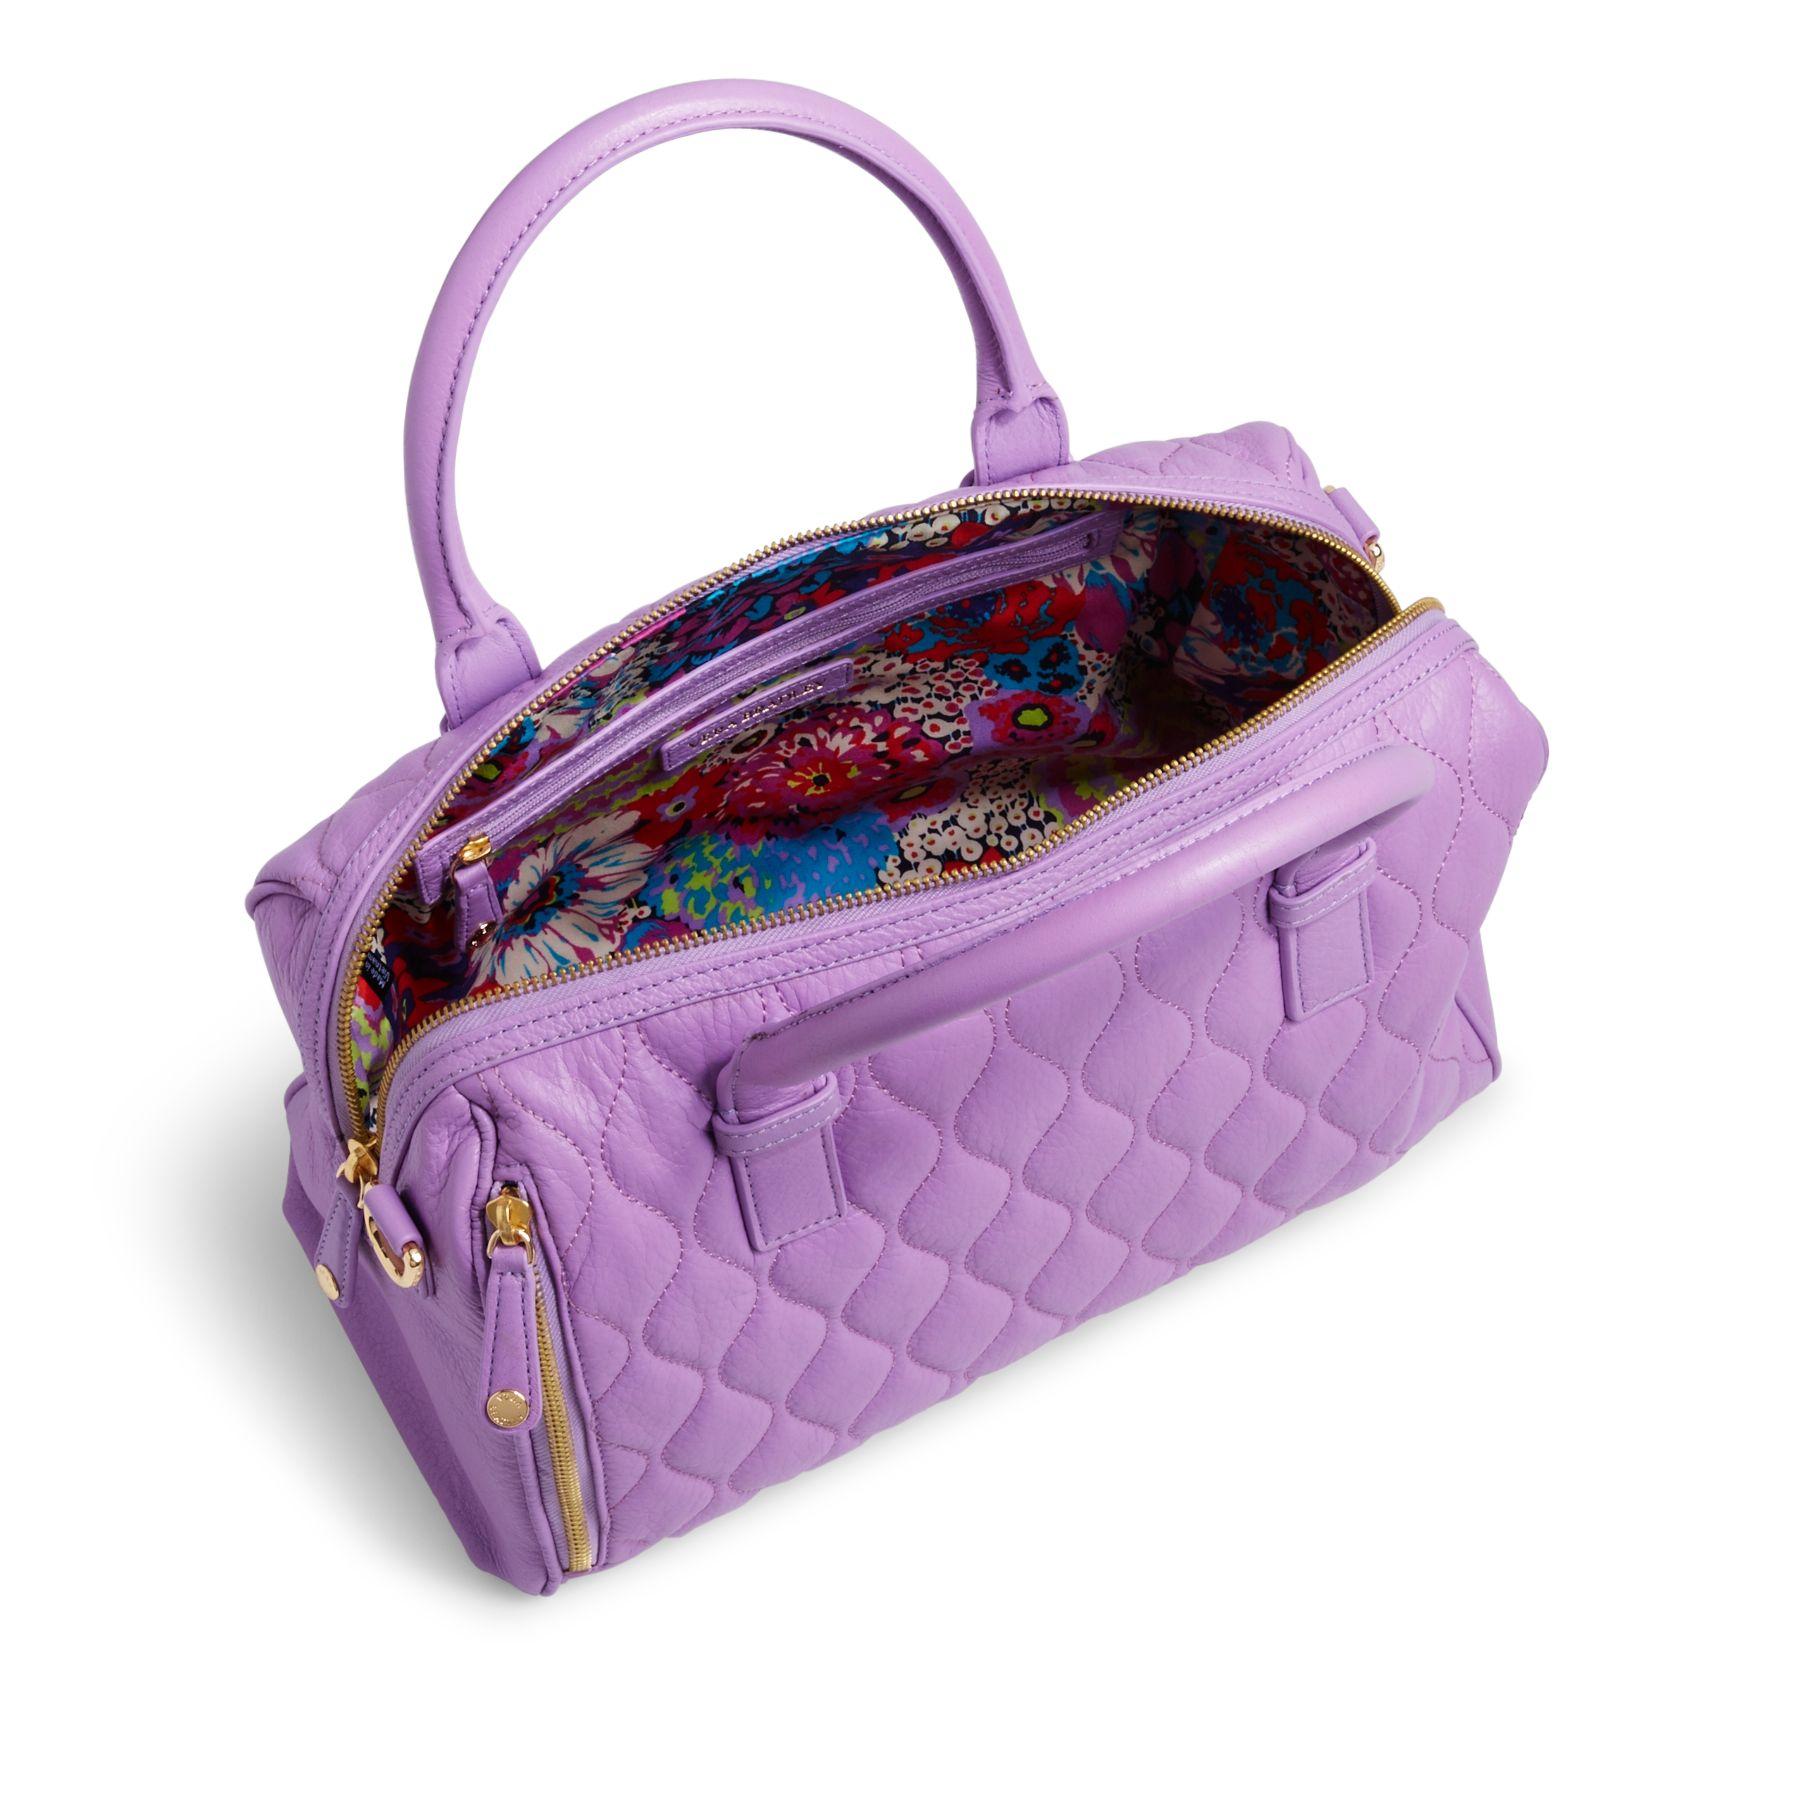 Vera Bradley Quilted Leather Marlo Satchel Bag Ebay